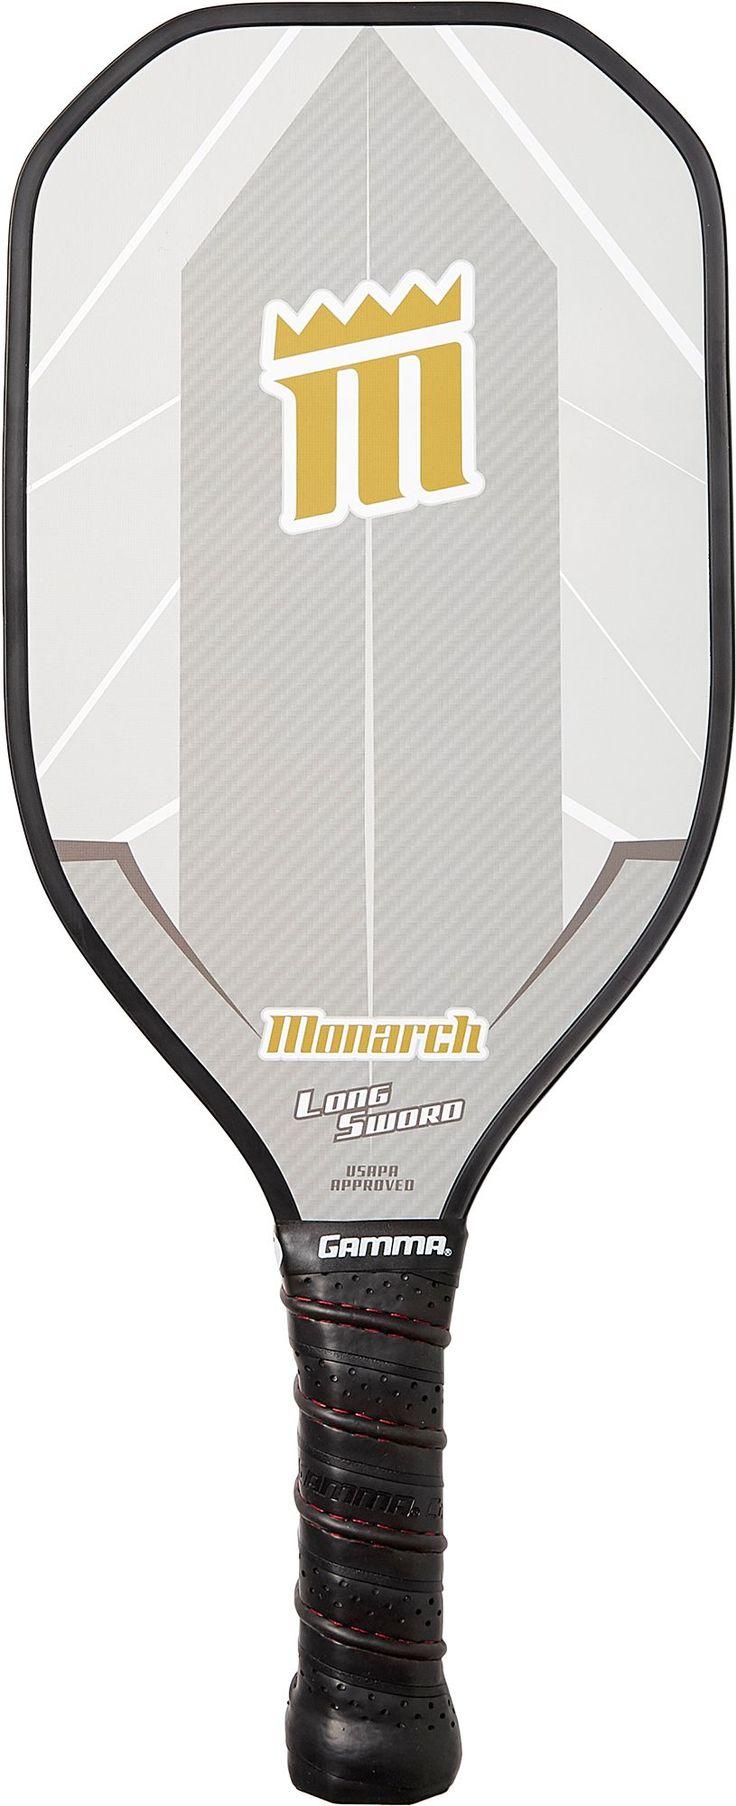 Monarch Long Sword Pro Pickleball Paddle Paddle